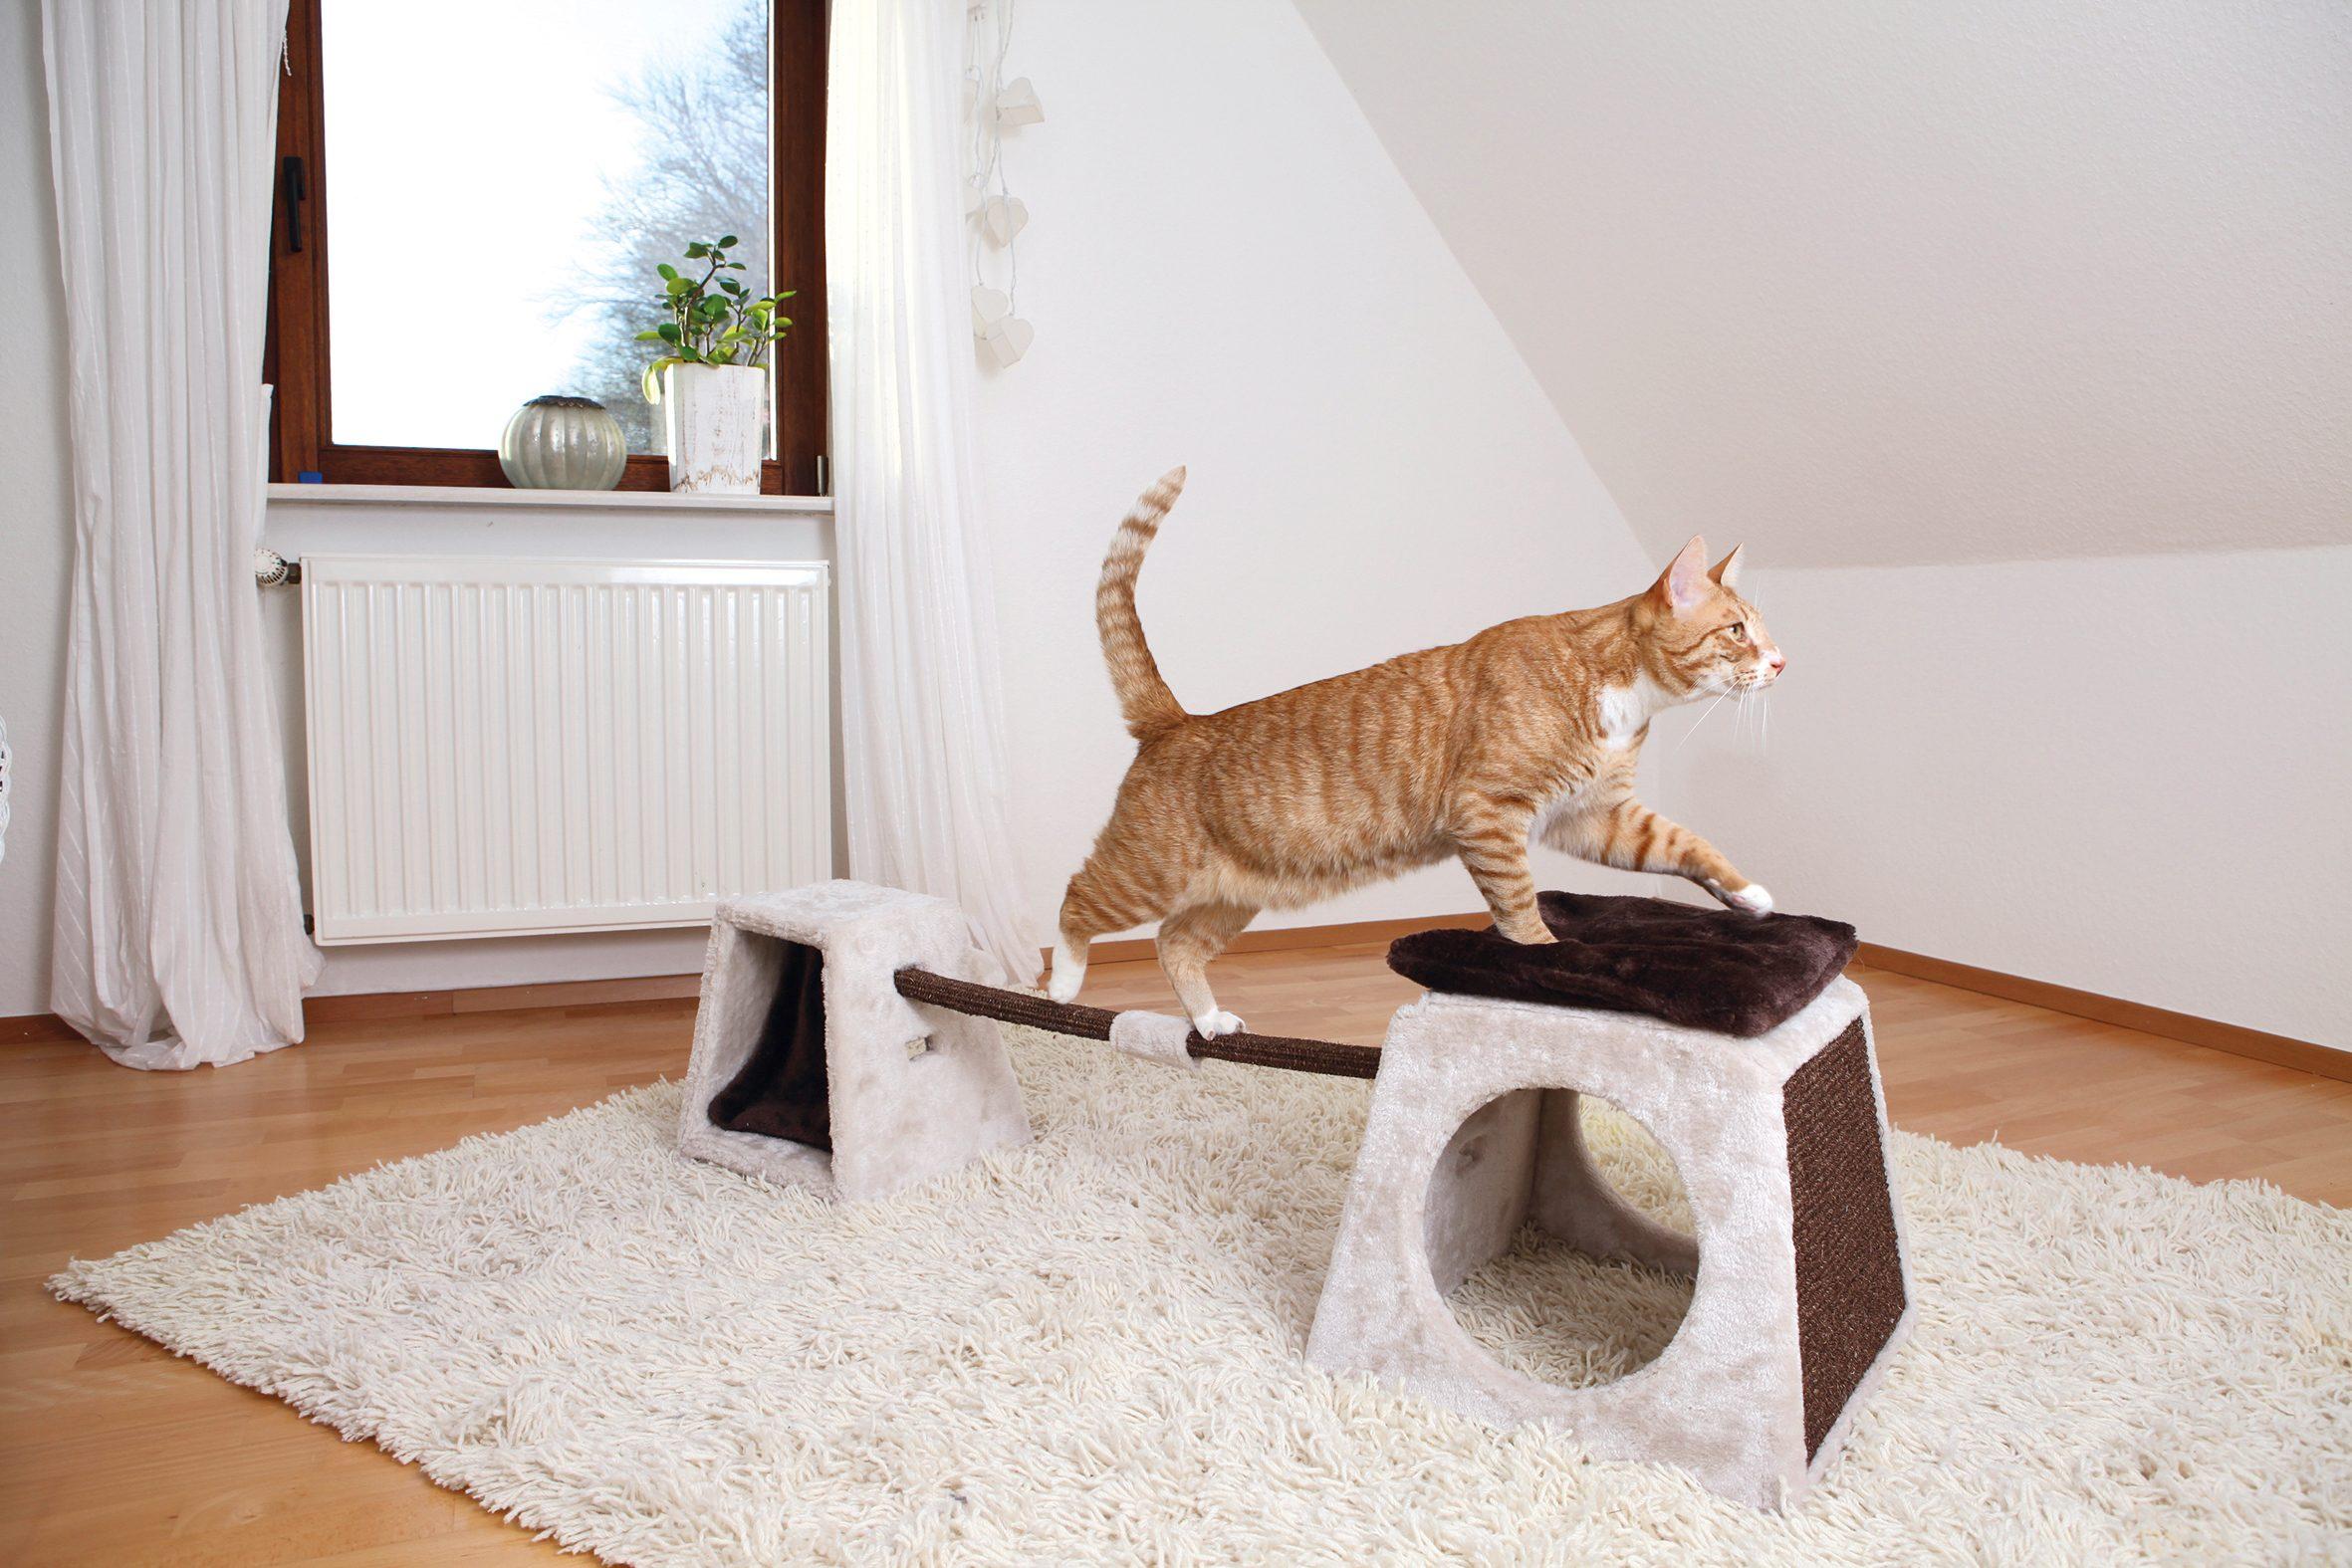 Katzenspielzeug »Agility Balancier-Set«, B/T/H: 175/40/35 cm, beige/braun